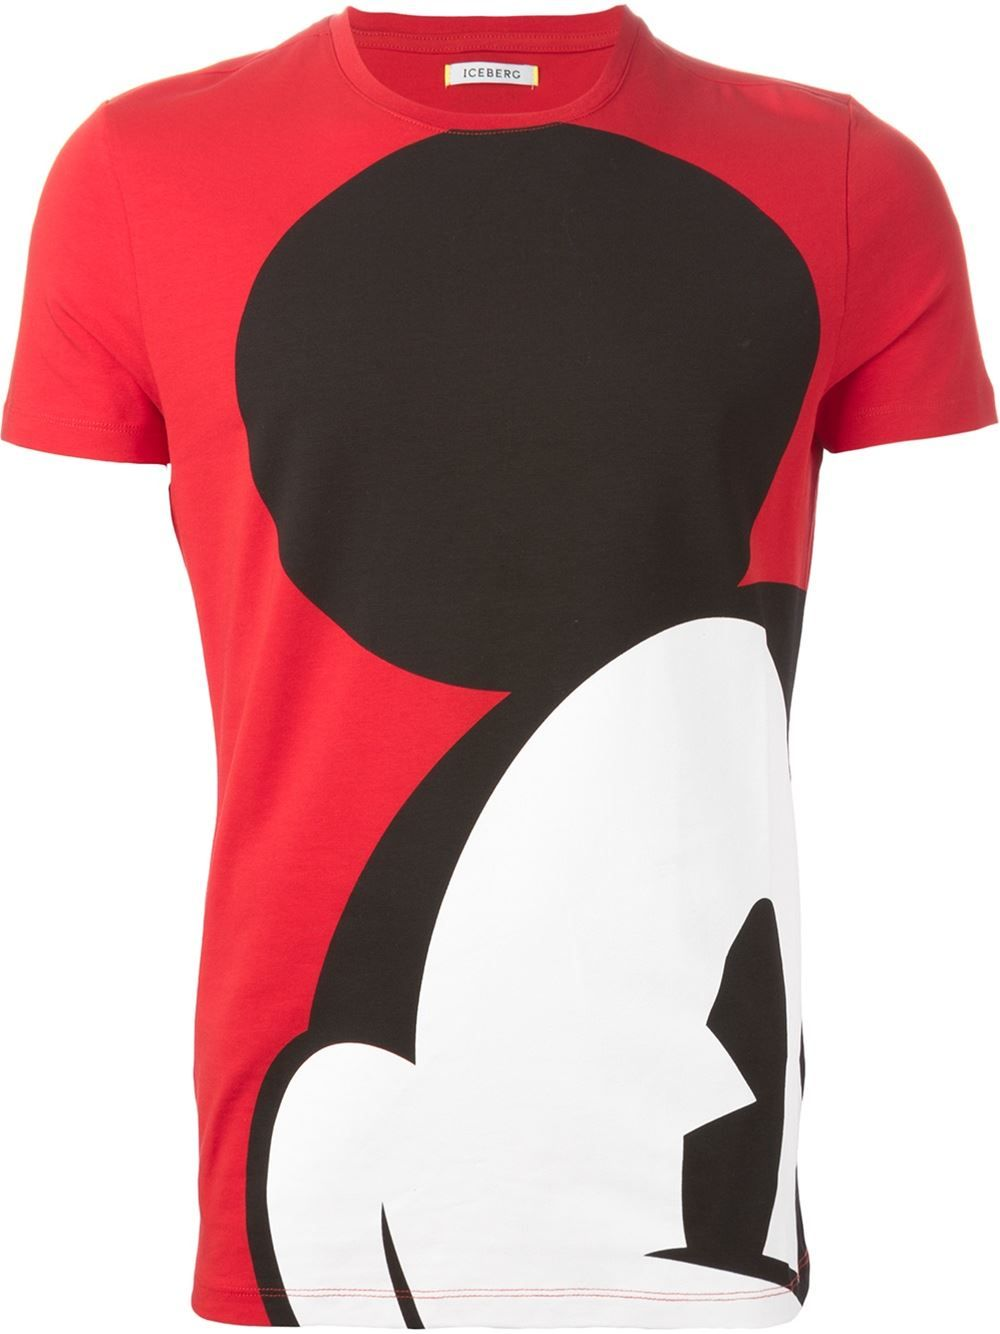 d57b8e6c9 Iceberg mickey mouse print T-shirt | tendencias in 2019 | Mickey ...